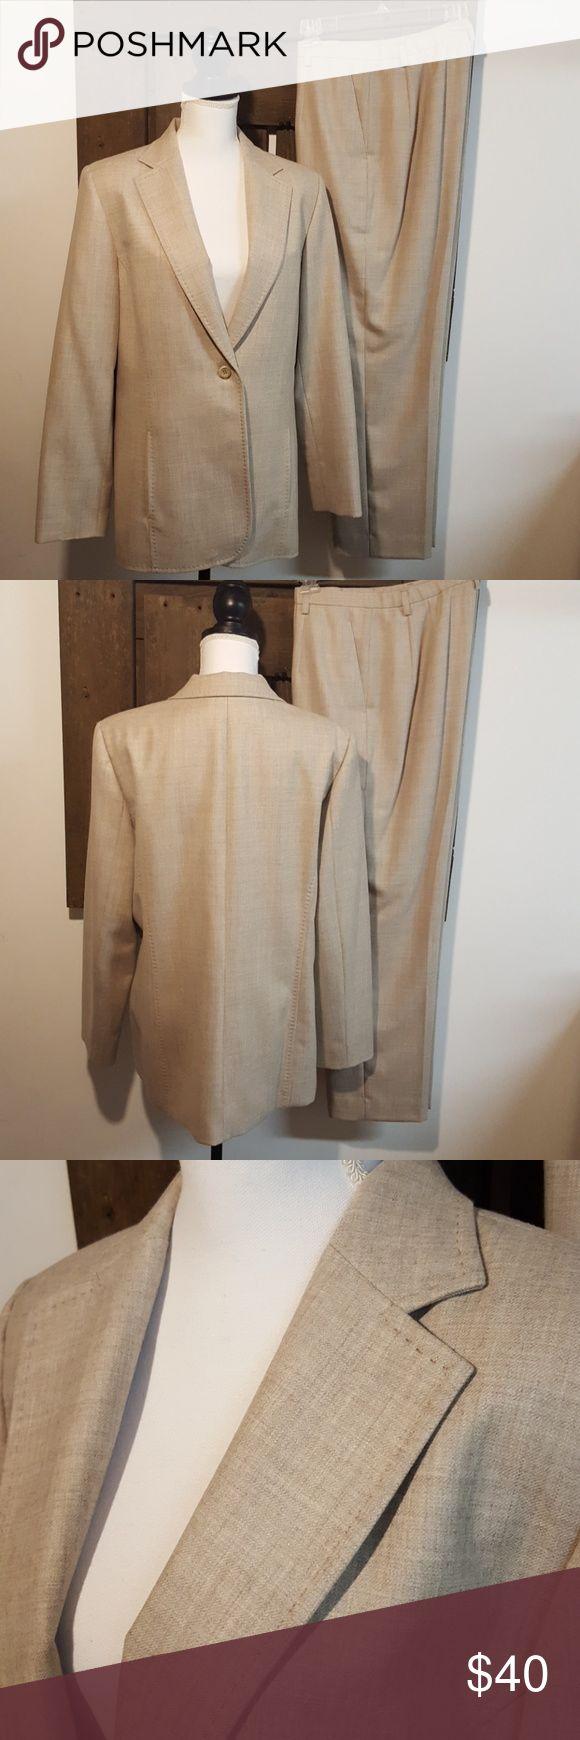 Pendleton Women's Petite Suit Set Beauriful cream colored Pendleton suit set. 100% virgin wool jacket and pants. Two slash pockets on the jacket and one button closure. Pants have zip/button closure and pockets. Both the jacket and pants are lined. In EUC. Pendleton Other